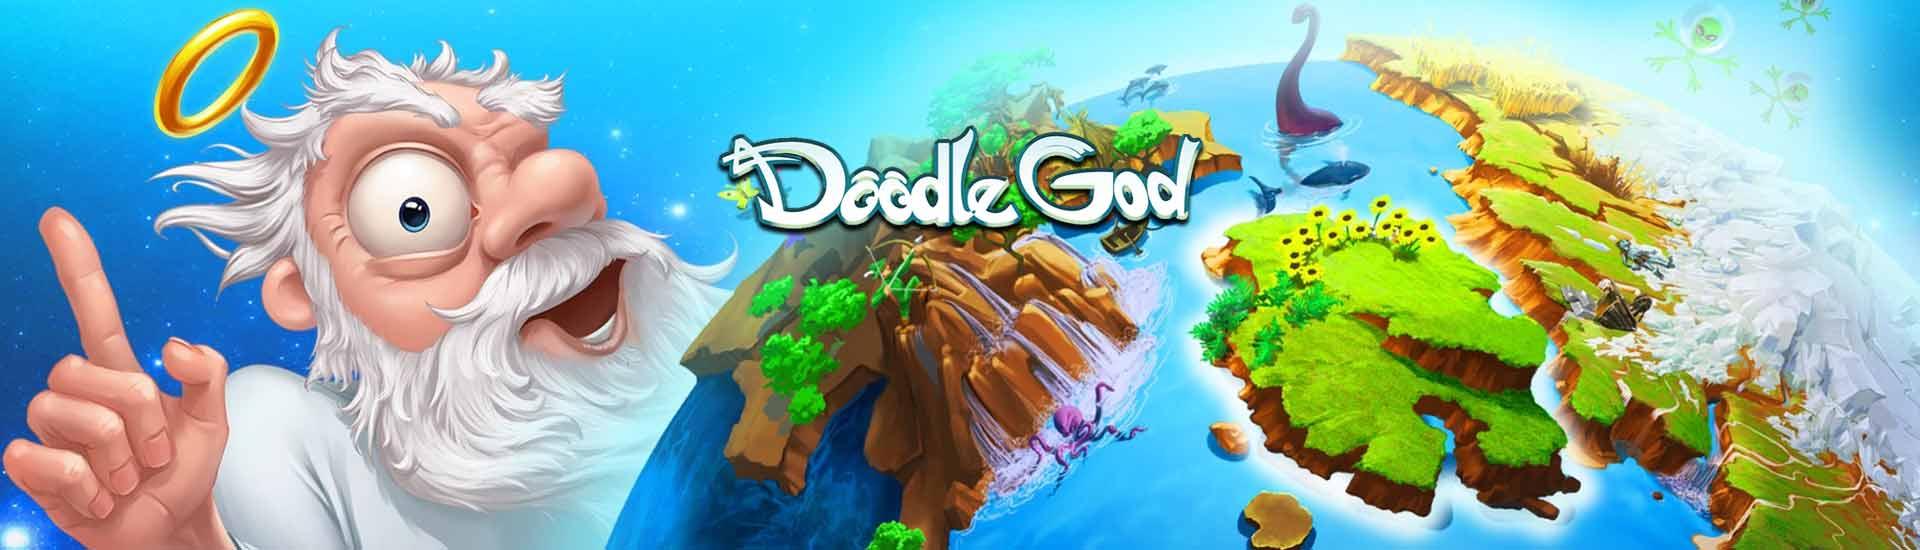 IndieGala: Doodle God GRATIS